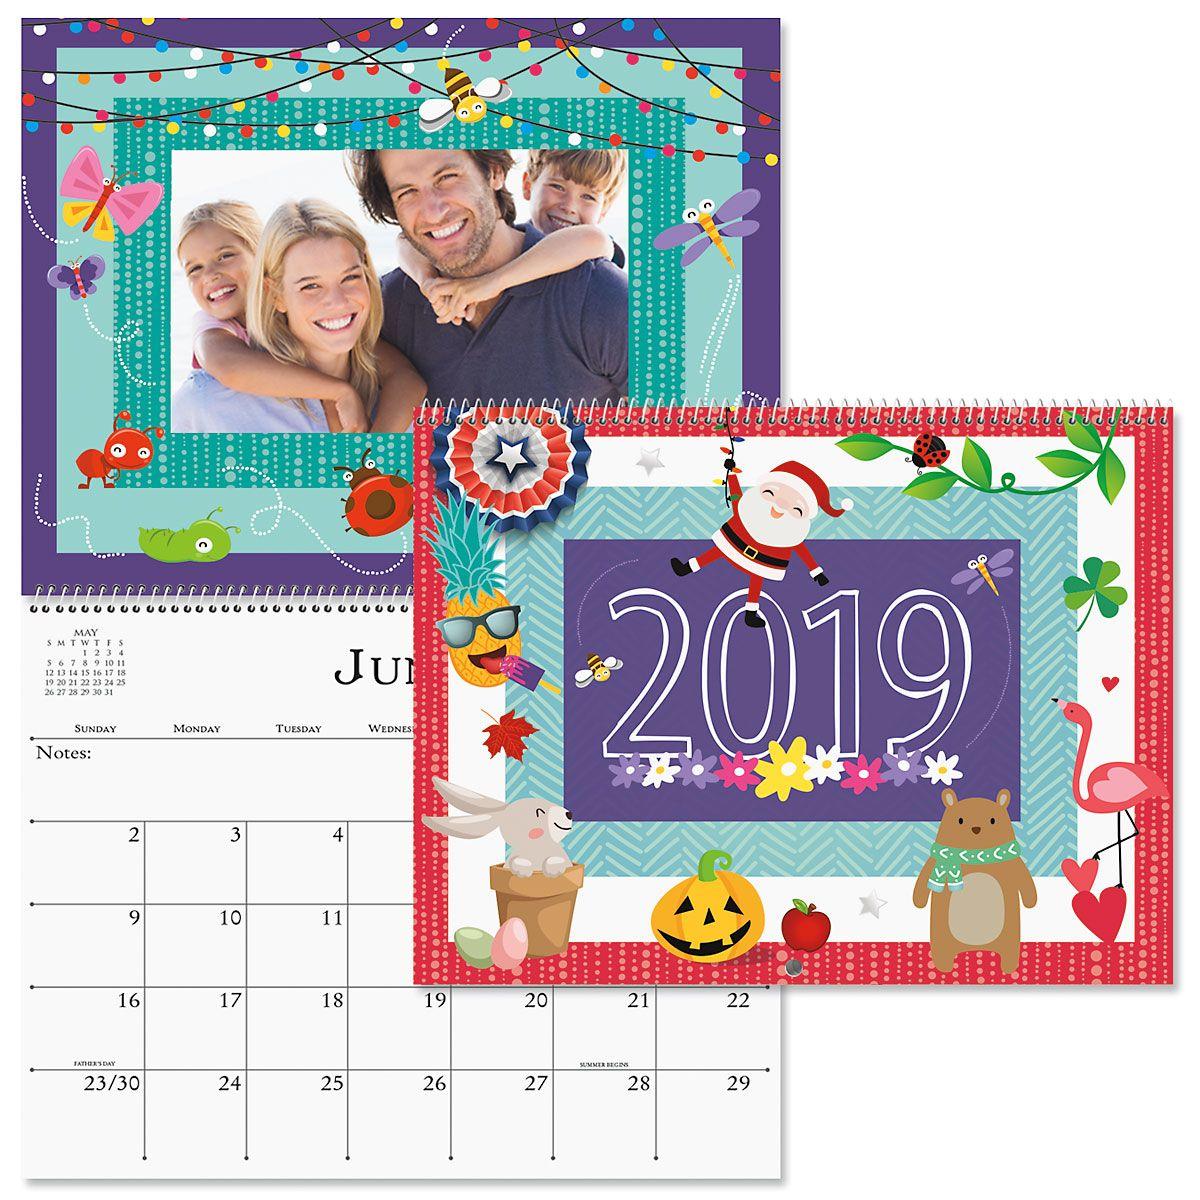 2019 Graphic Photo Calendar